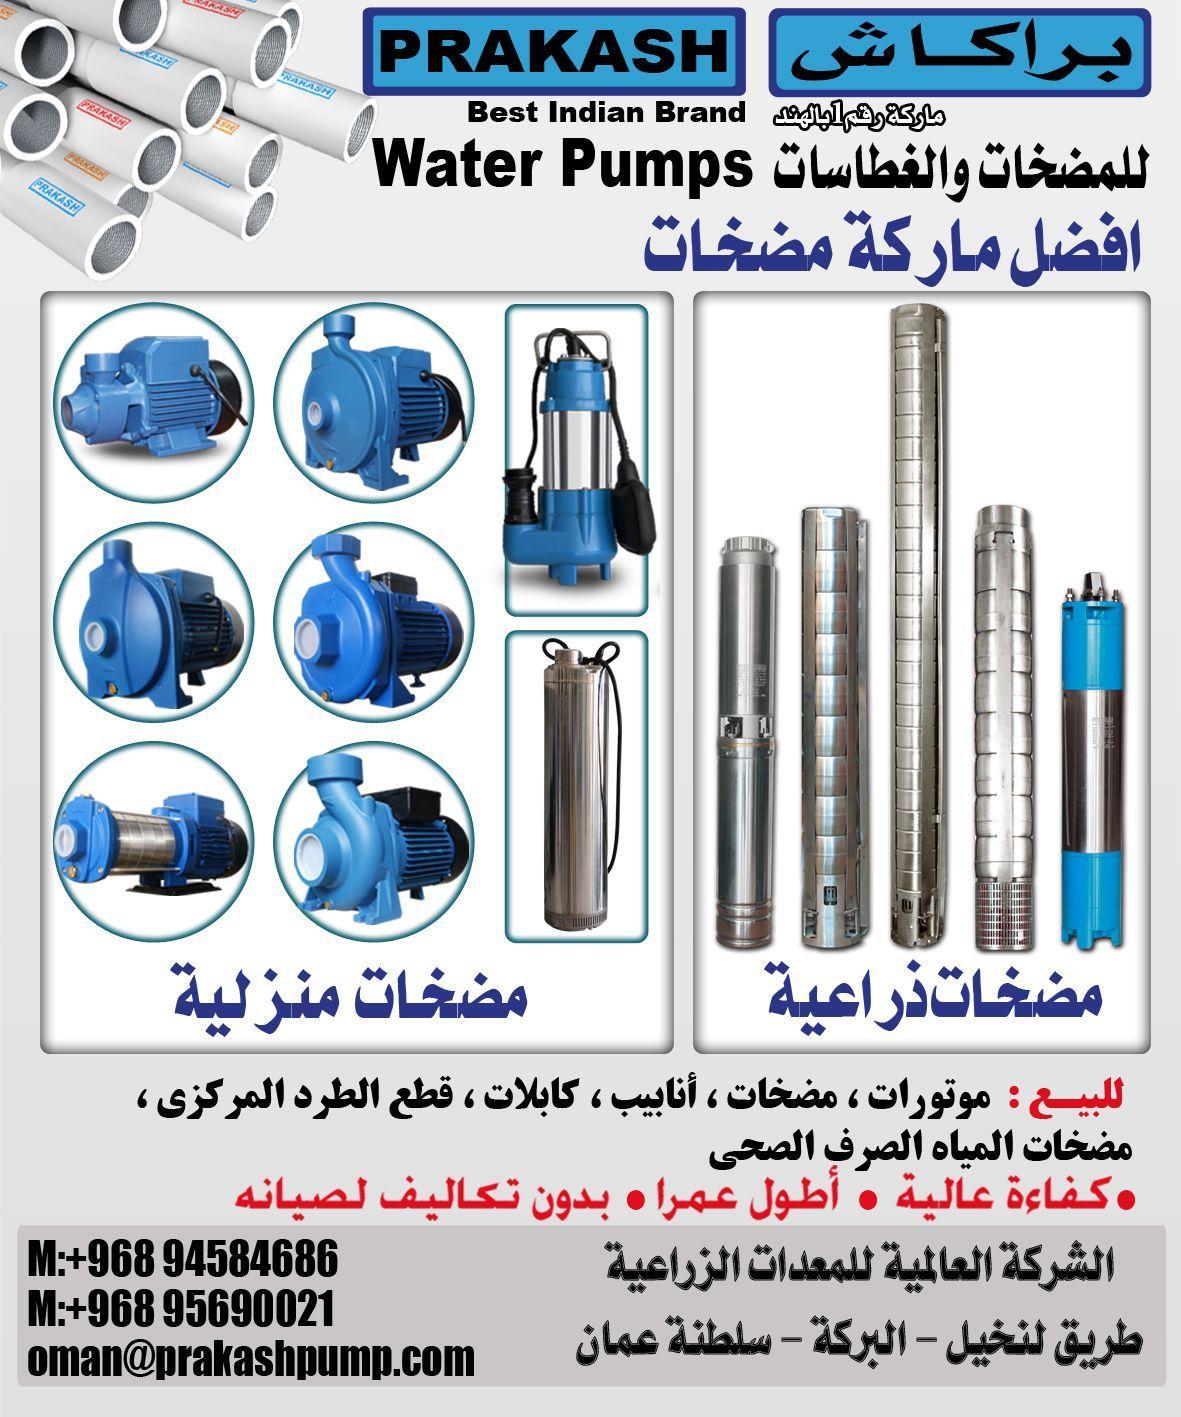 Prakash Prakashpump Prakashpumpest Water Motor Waterpump New Design Sale Uae Oman Water Pumps Oman Best